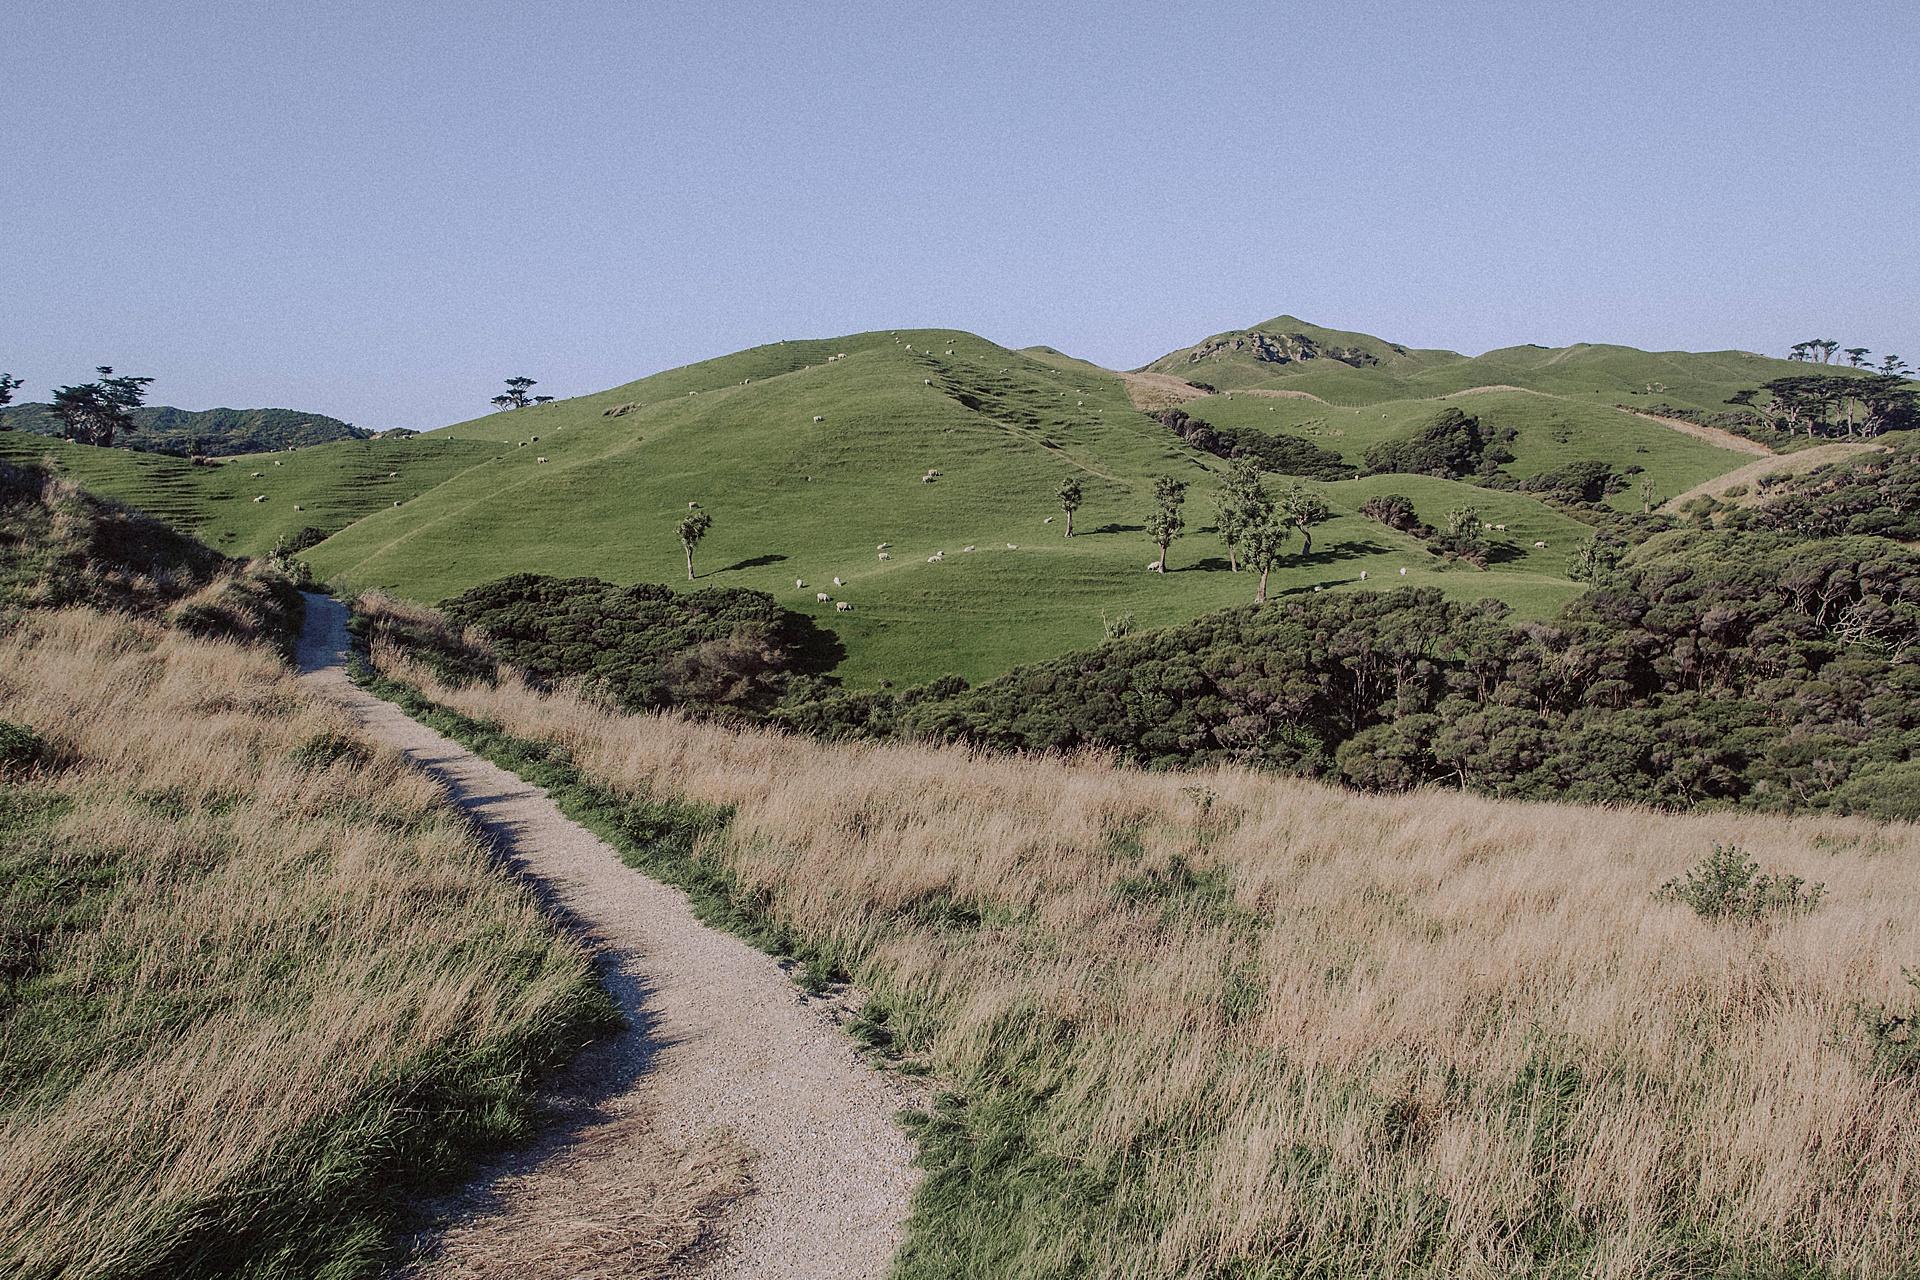 family-roadtrip-neuseeland-travelnewzealand-danielzube_0568.jpg